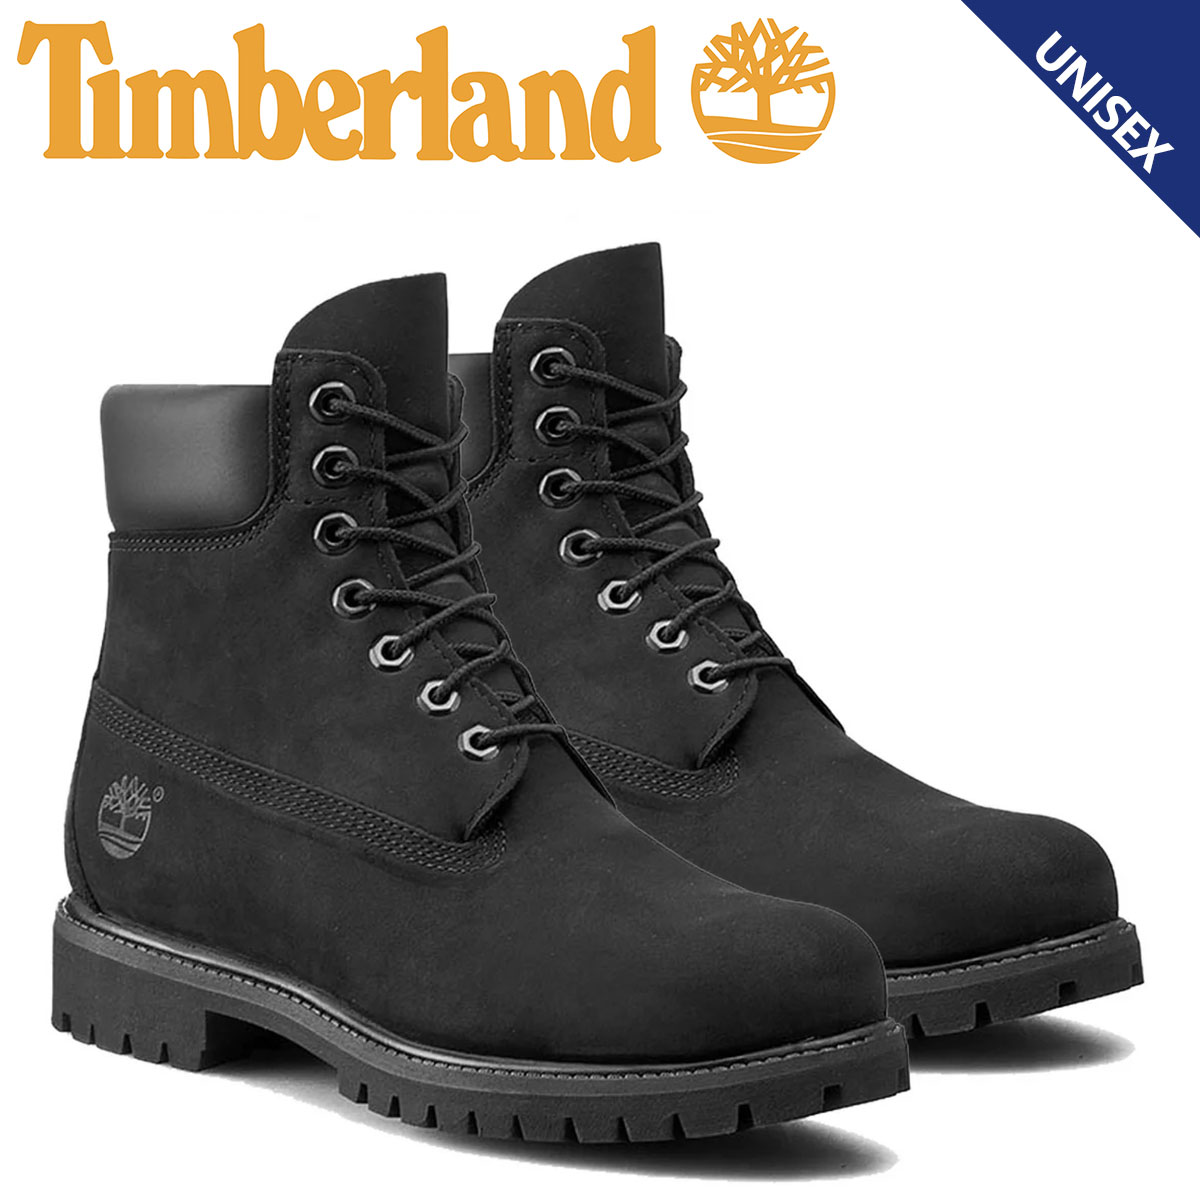 Timberland 6INCH PREMIUM WATERPROOF BOOTS ブーツ メンズ レディース 6インチ ティンバーランド 10073 プレミアム ウォータープルーフ 防水 [6/26 追加入荷]